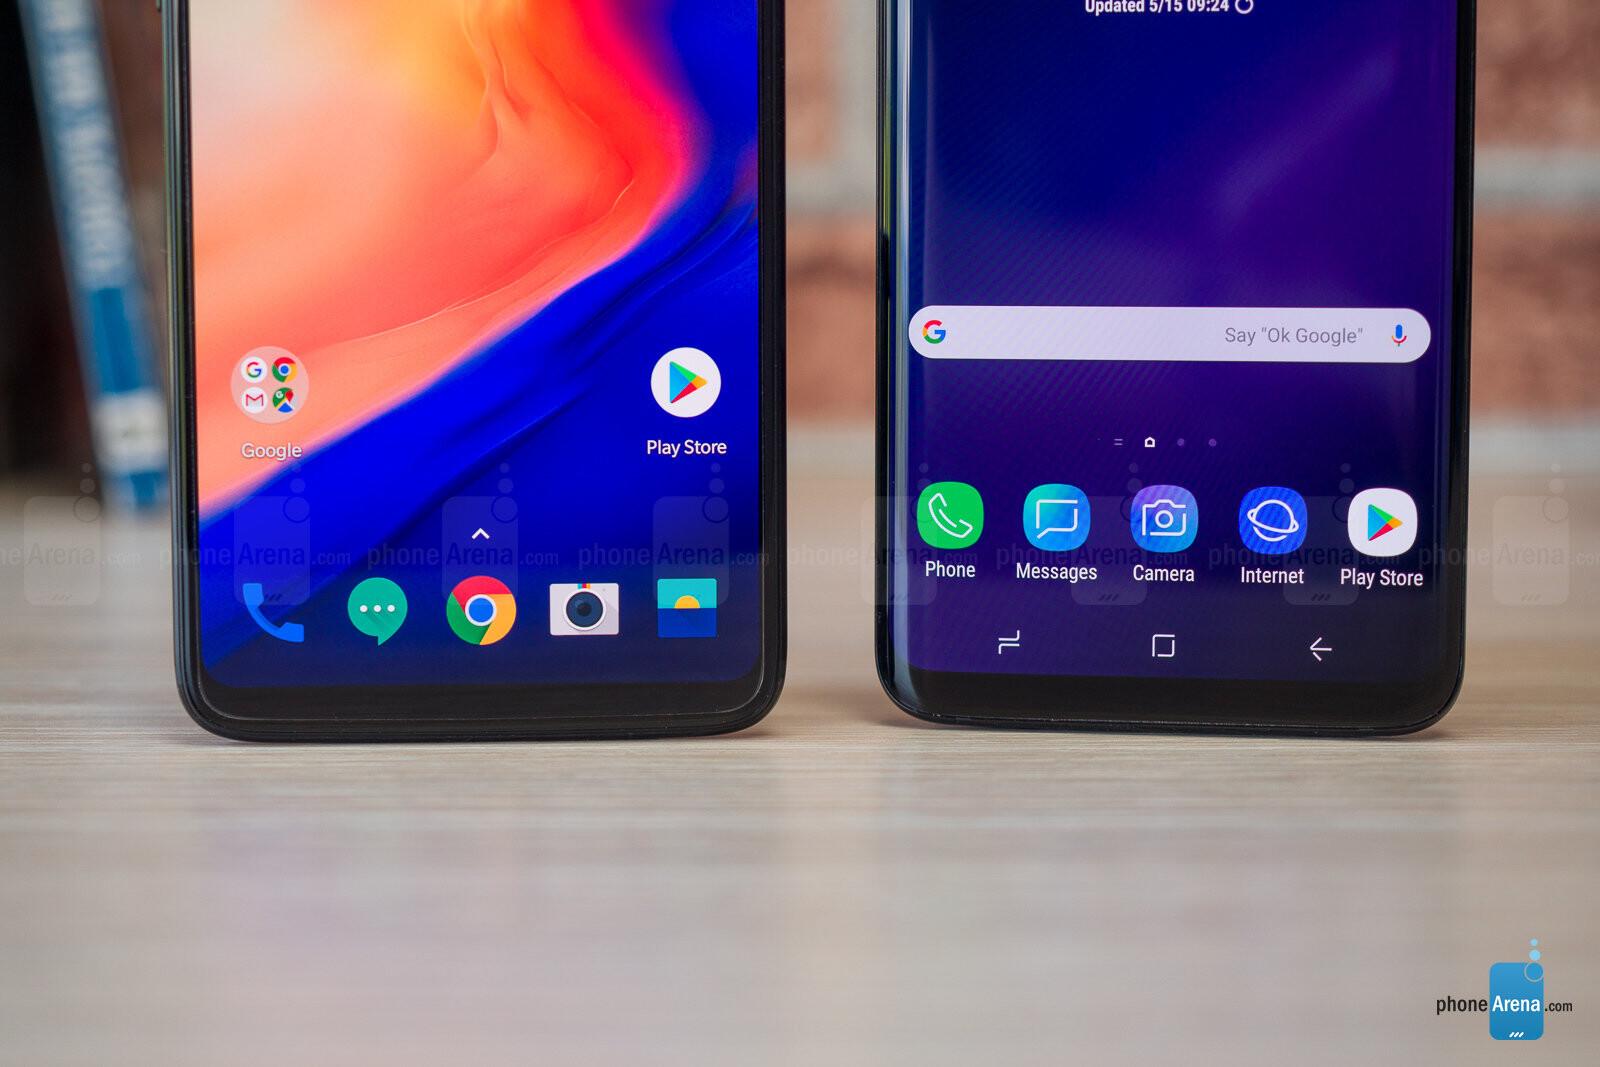 OnePlus 6 vs Samsung Galaxy S9+ - PhoneArena